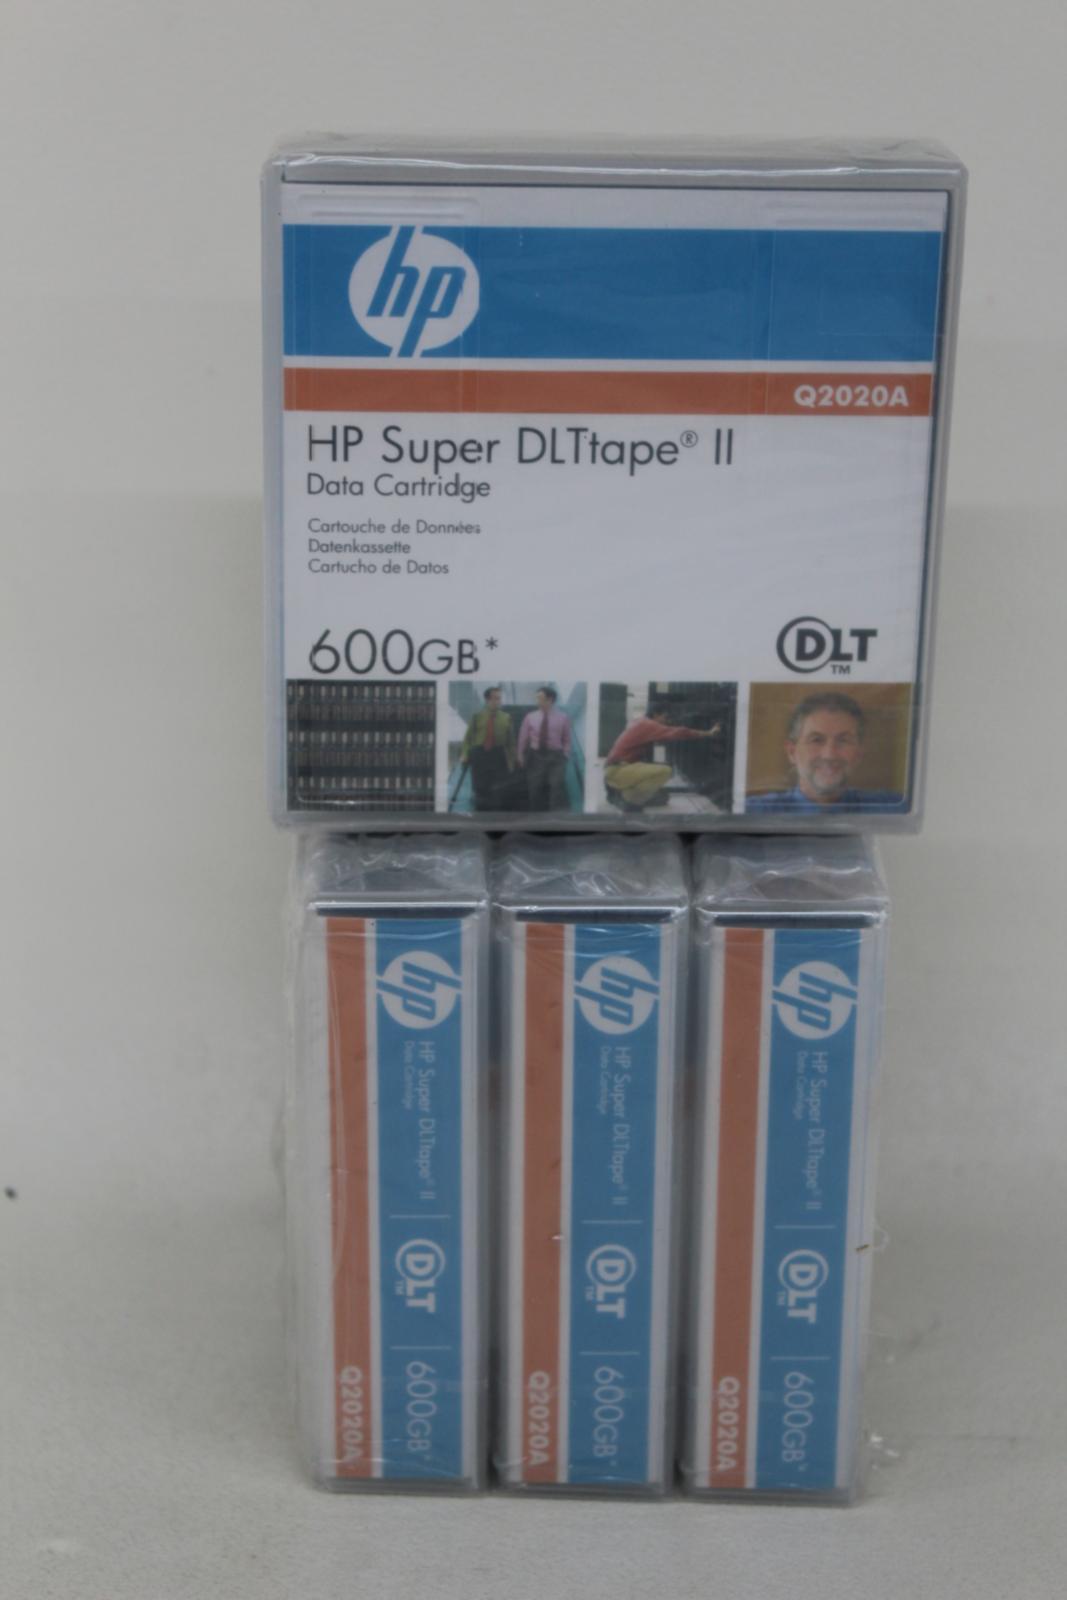 HP-Q2020A-Super-DLtape-II-Data-Tape-Square-cartouche-600-Go-job-lot-4x-NEUF miniature 11